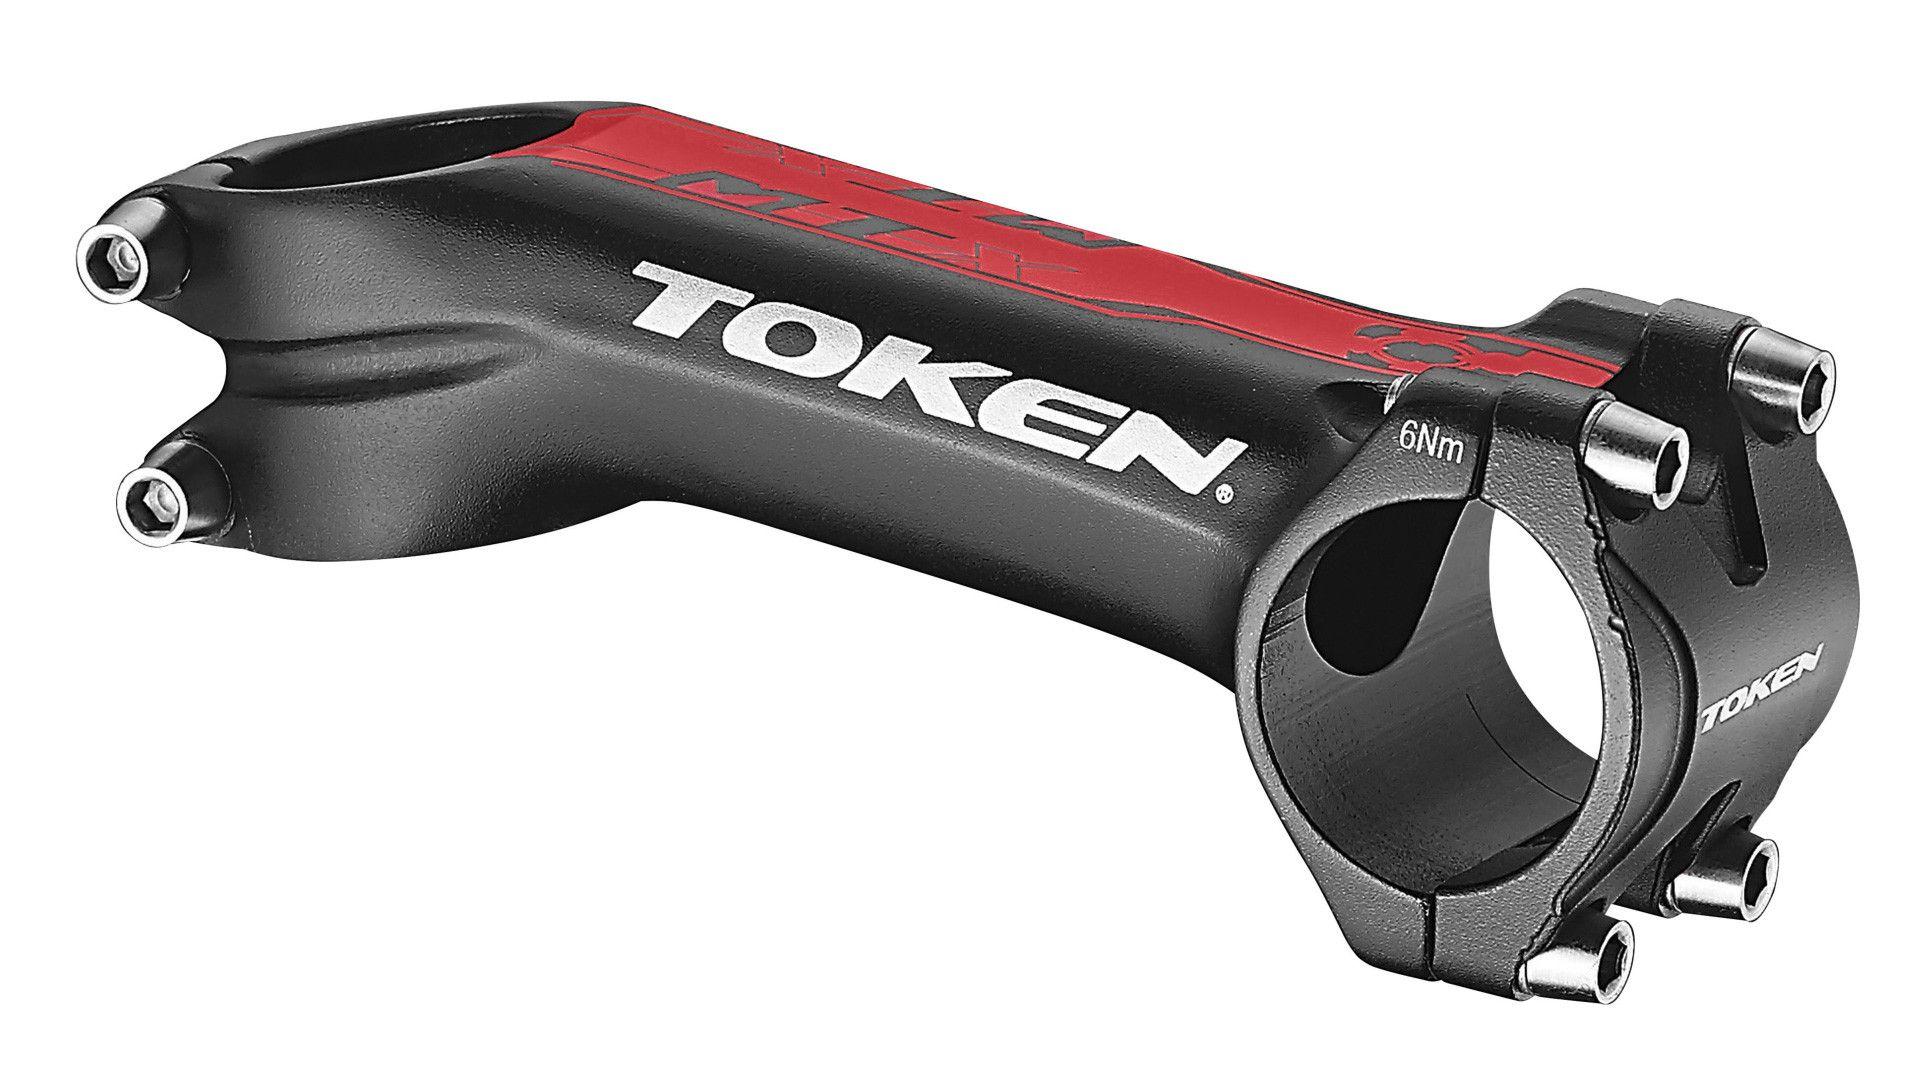 Avanço Mesa Token Pro Tk9320 Red Bike 90mm 20Graus